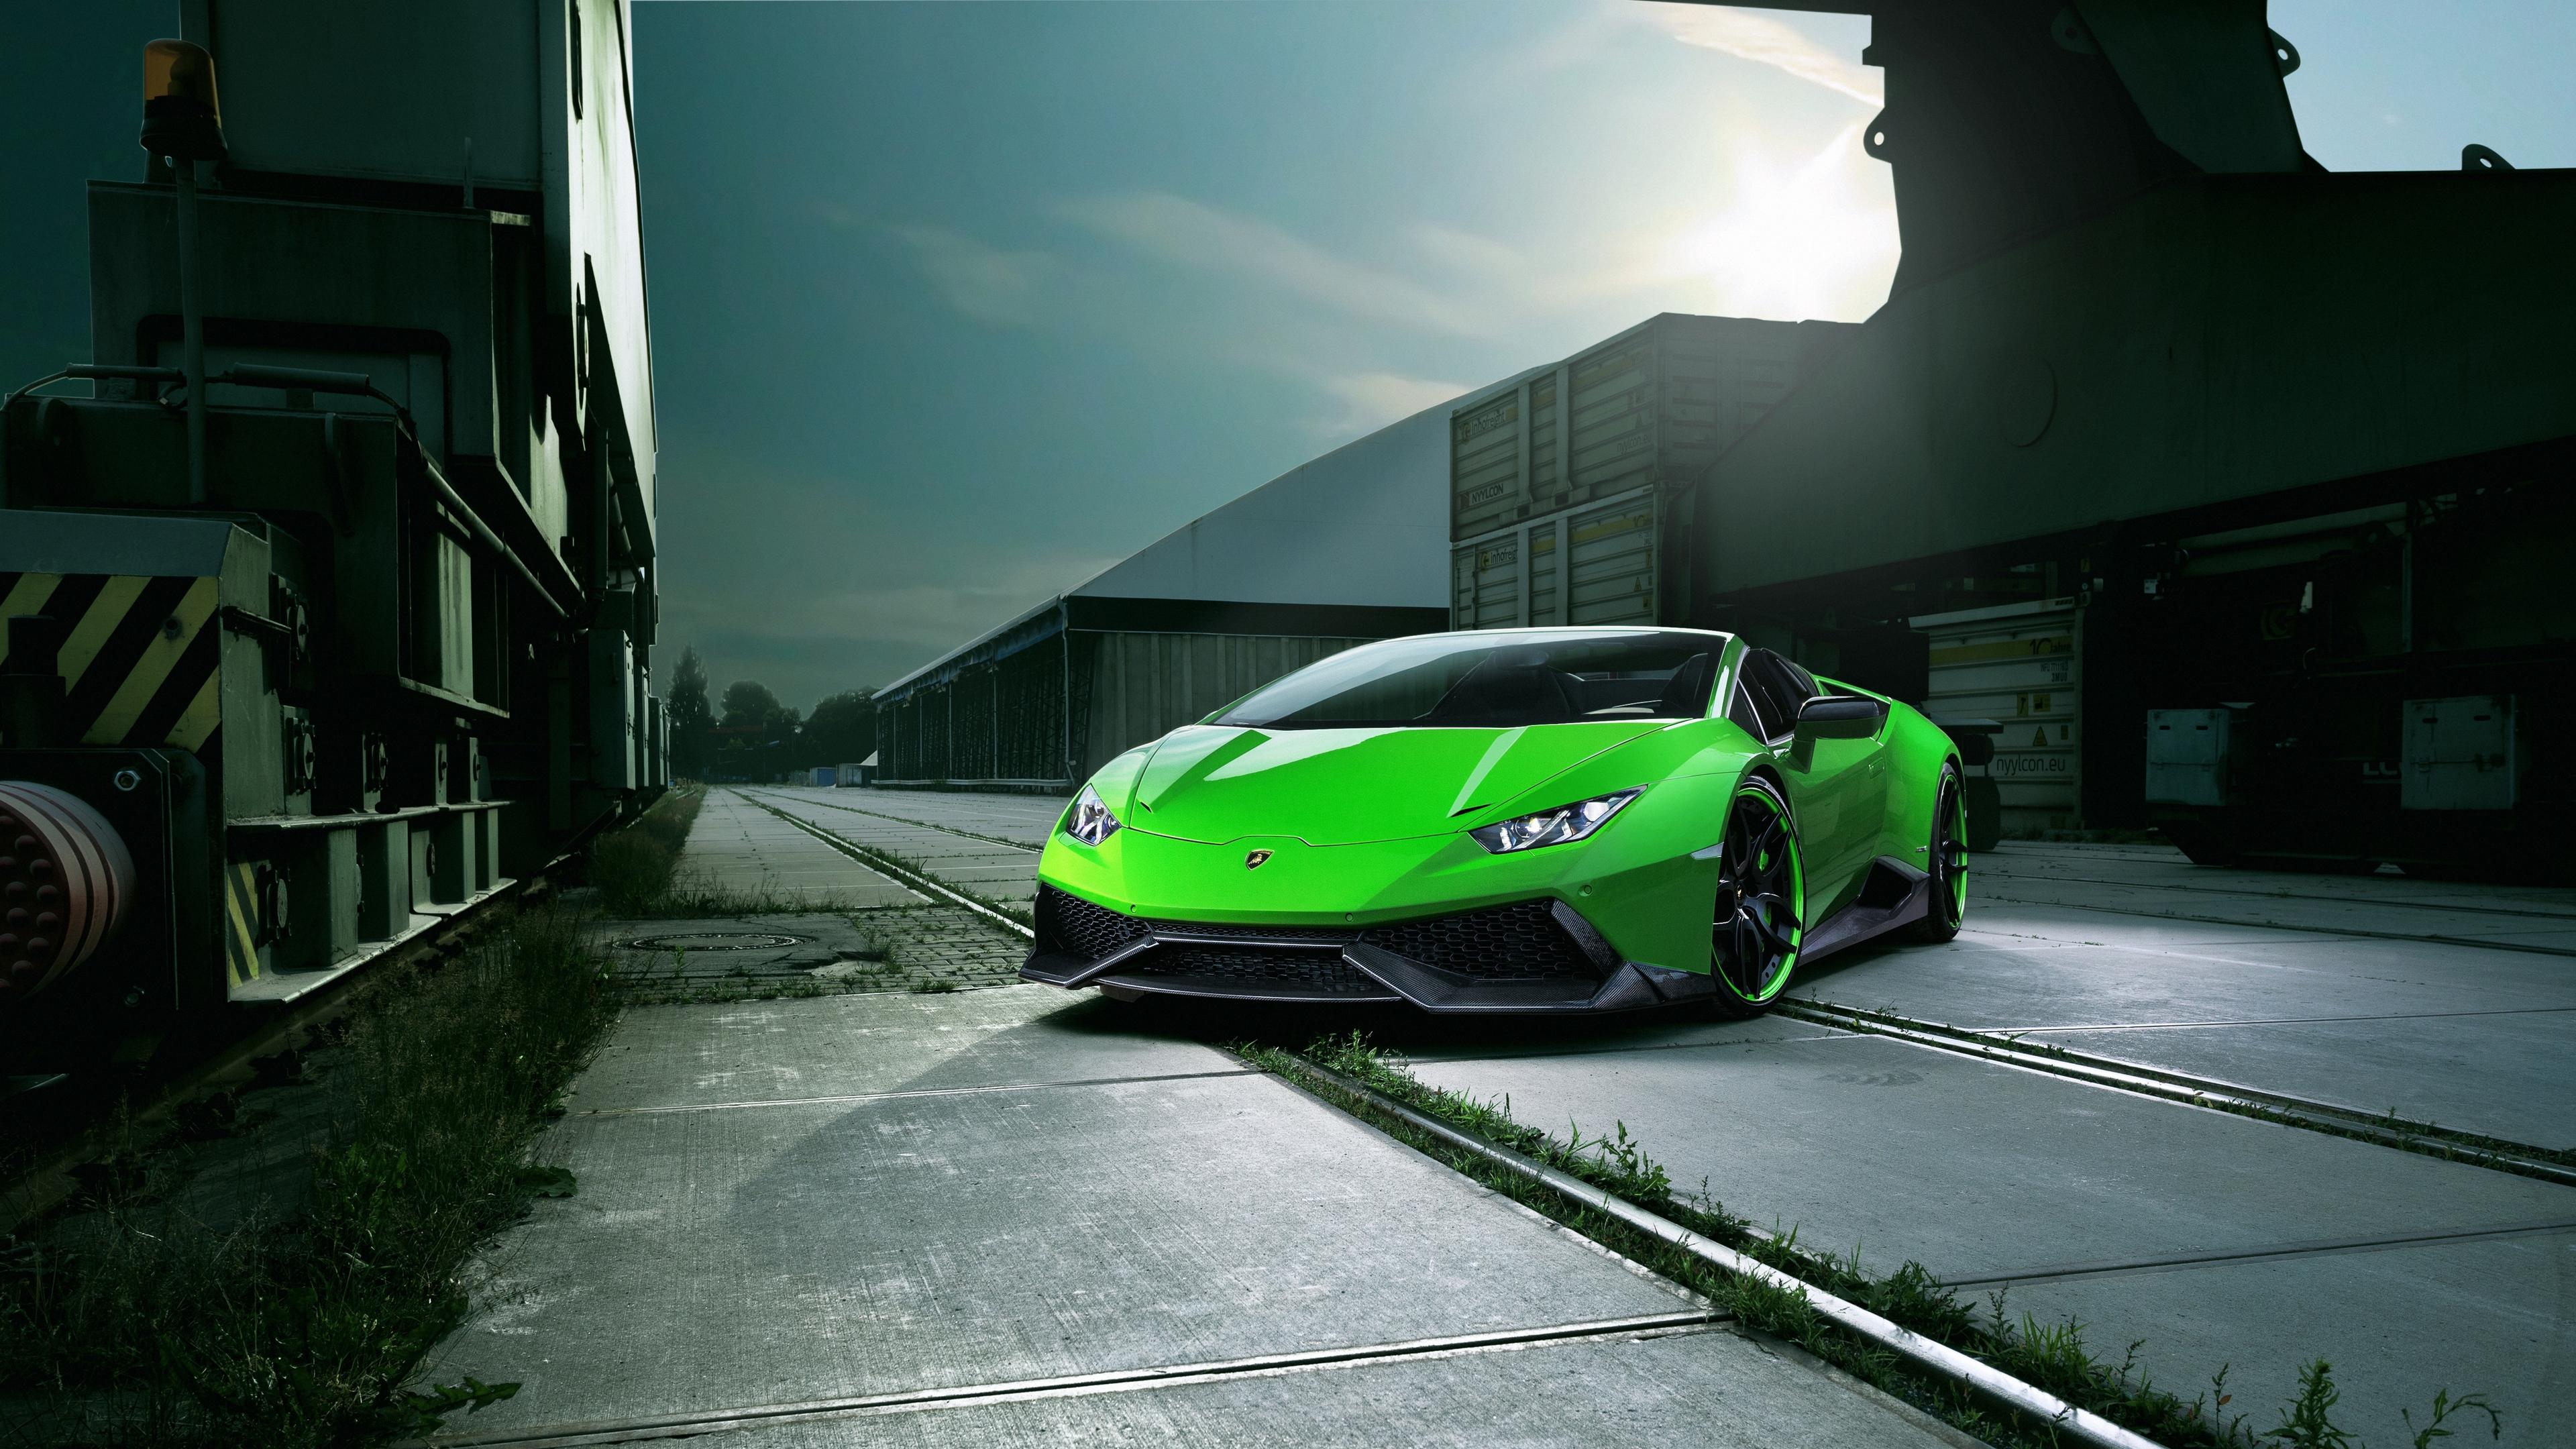 lamborghini huracan spyder green front view 4k 1538937099 - lamborghini, huracan, spyder, green, front view 4k - Spyder, Lamborghini, Huracan